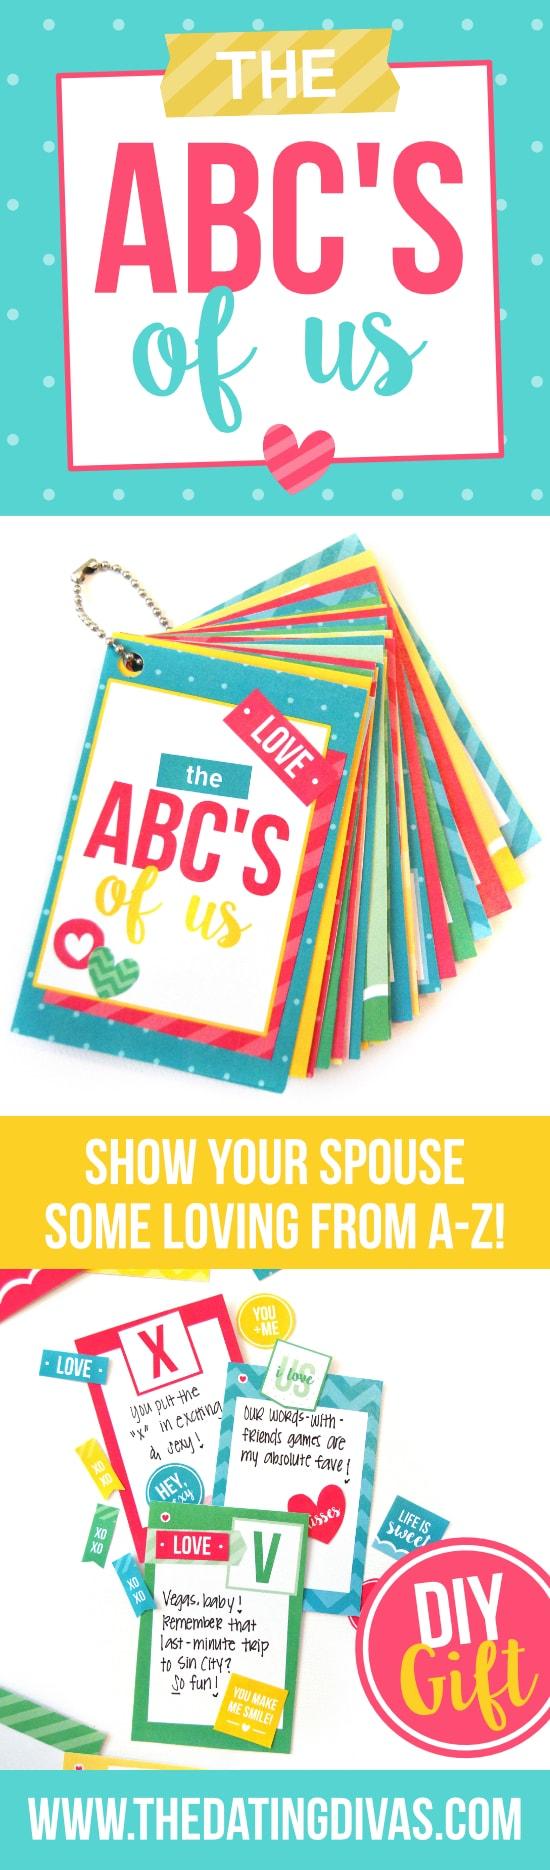 ABC's of Us DIY Gift